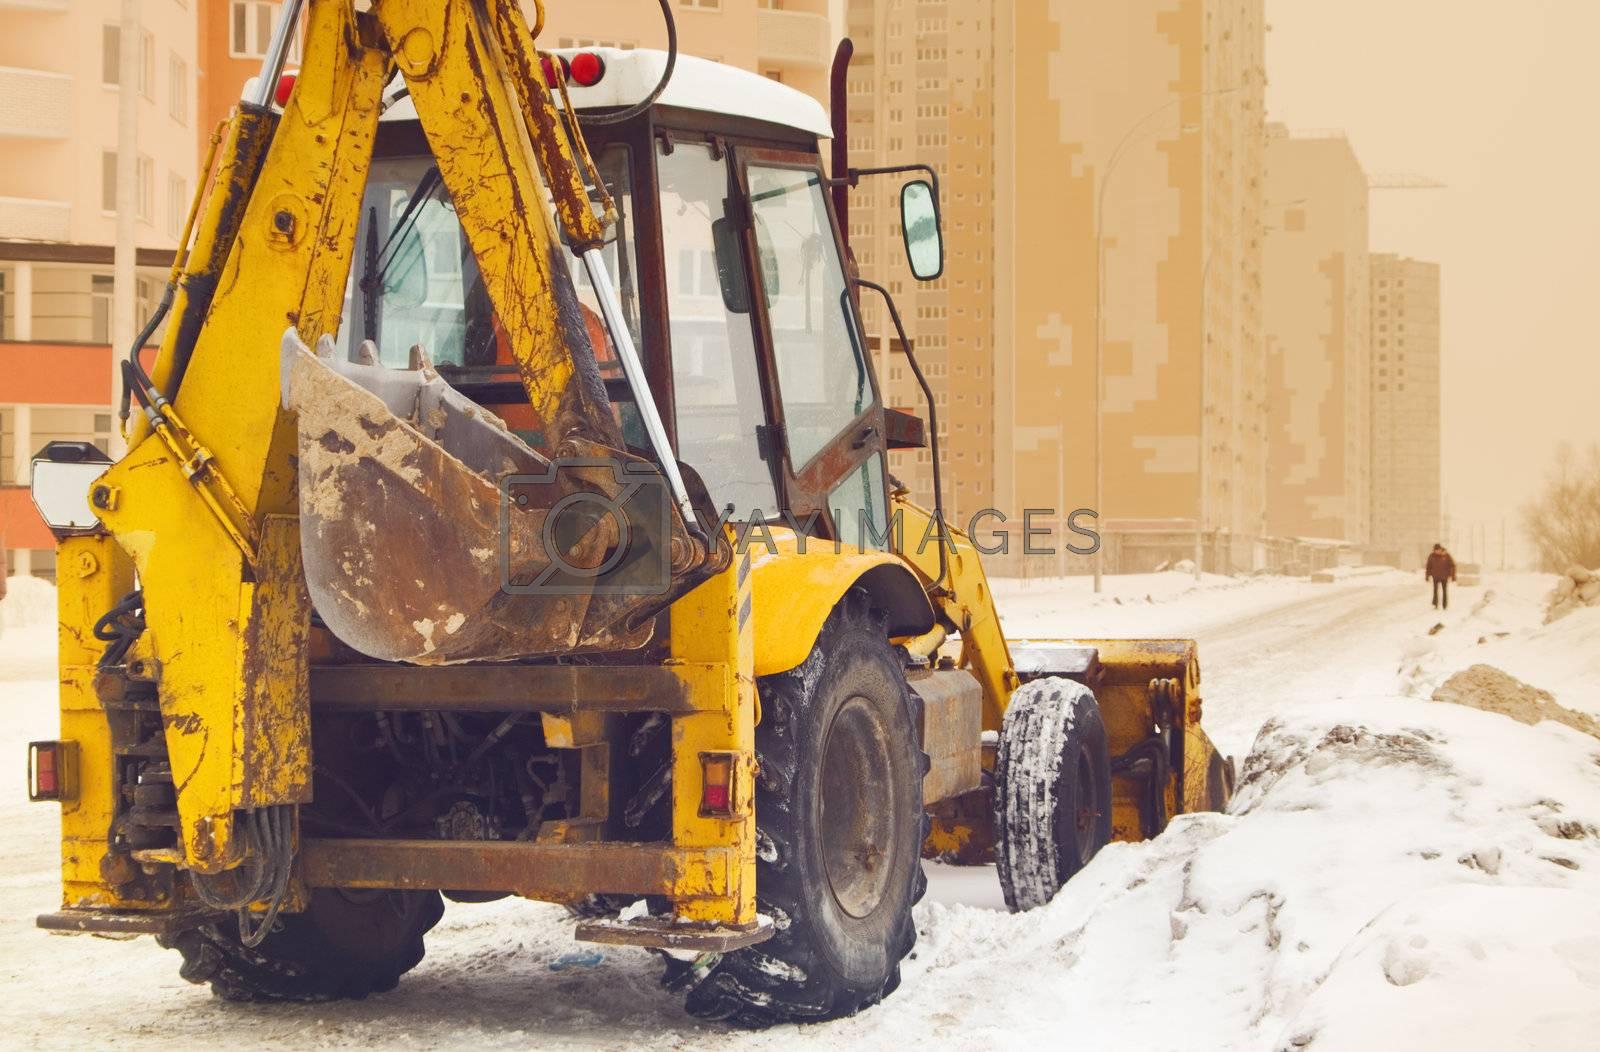 yellow snow plow on an empty street